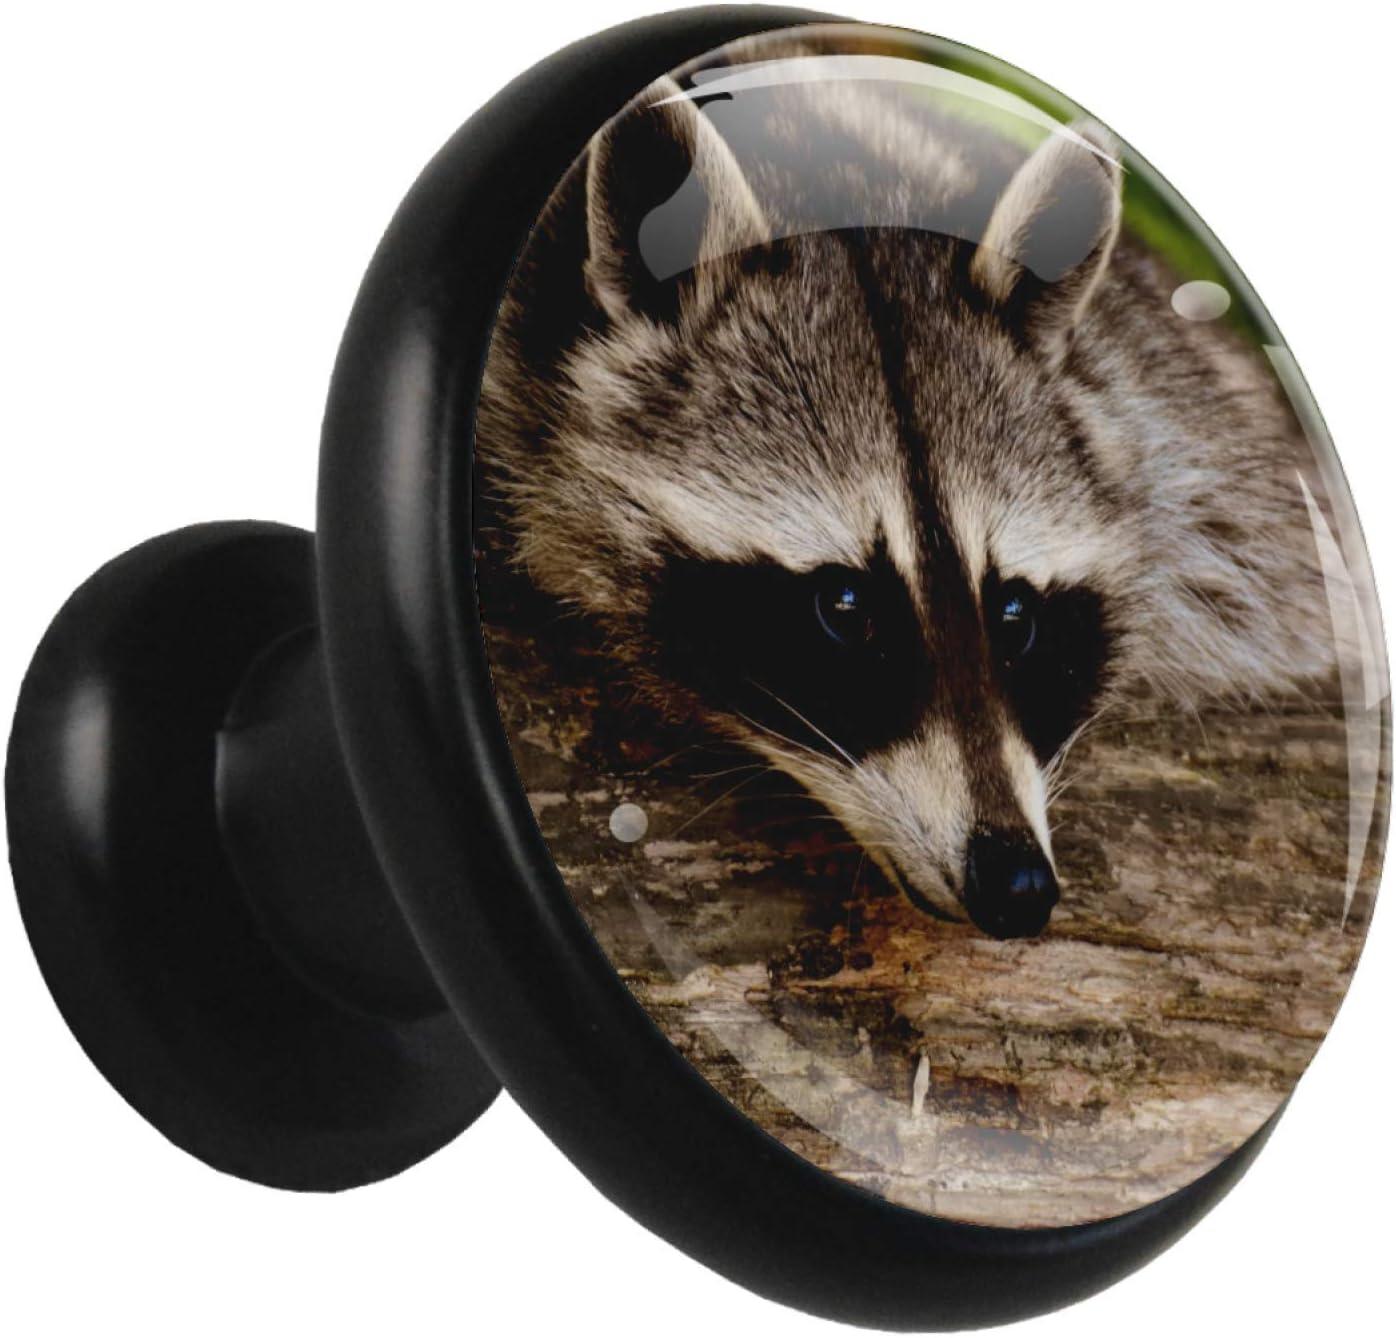 Bathroom Cabinet Knobs Cute Brown Raccoon Kitchen Knobs Metal Black Modern Furniture Glass Knobs for Jewelry Box Dresser (4pcs) 1.26x1.18x0.66in